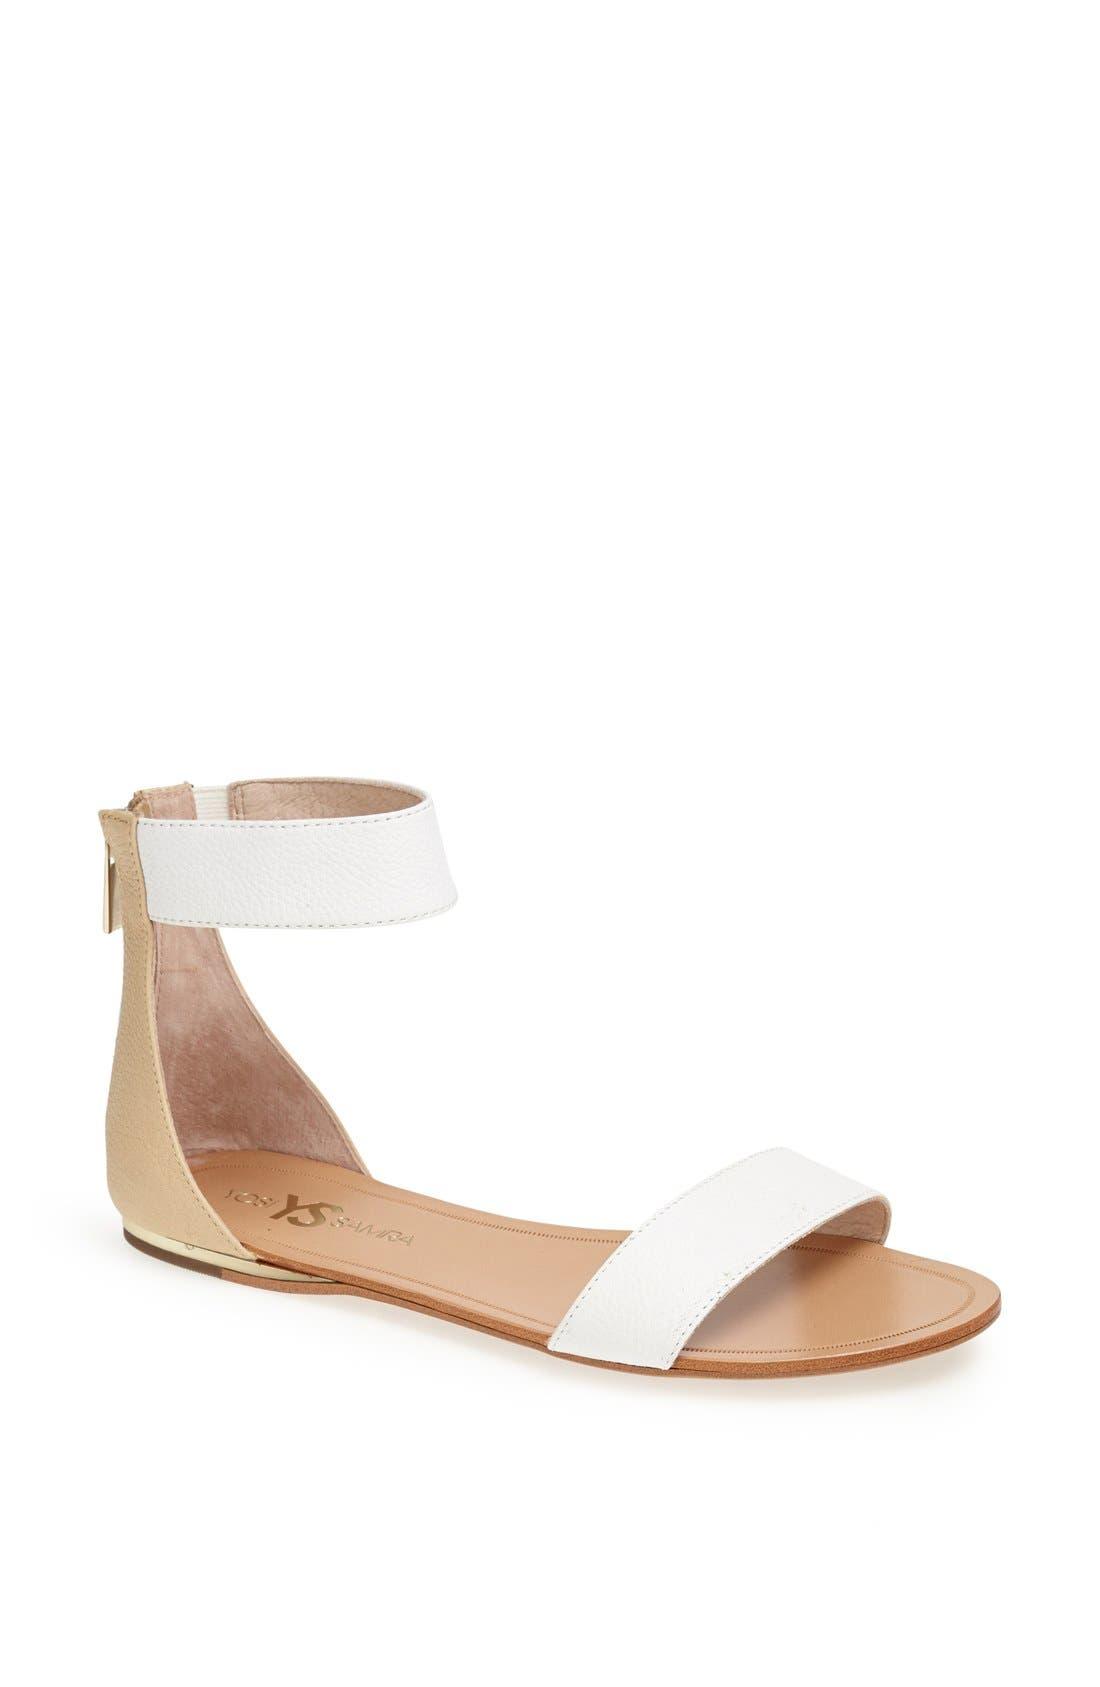 Main Image - Yosi Samra 'Cambelle' Ankle Strap Sandal